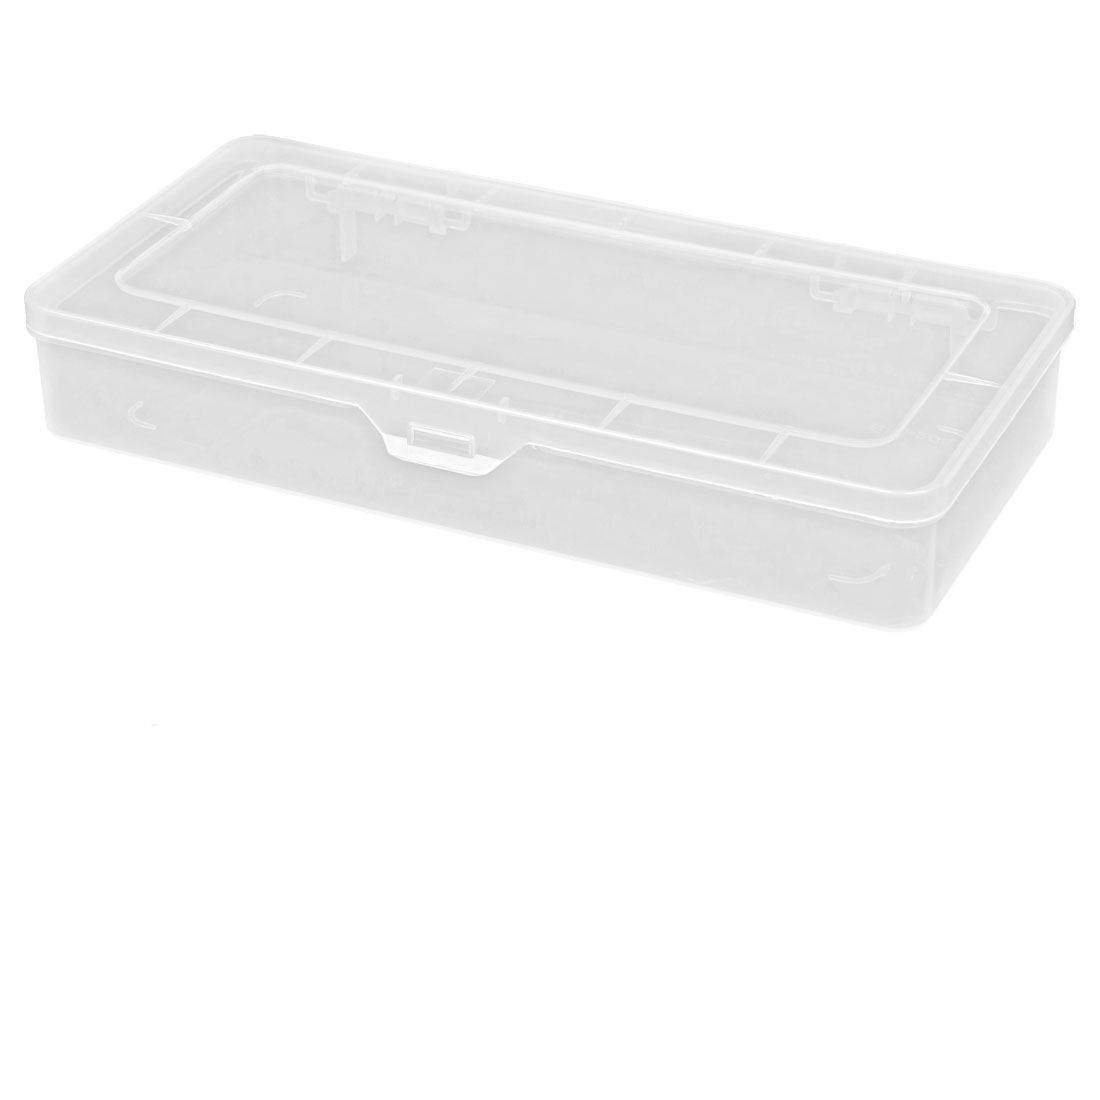 "Unique Bargains Plastic Jewelry Electronic Component Storage Clear Box Case 10"" x 4.7"" x 1.6"